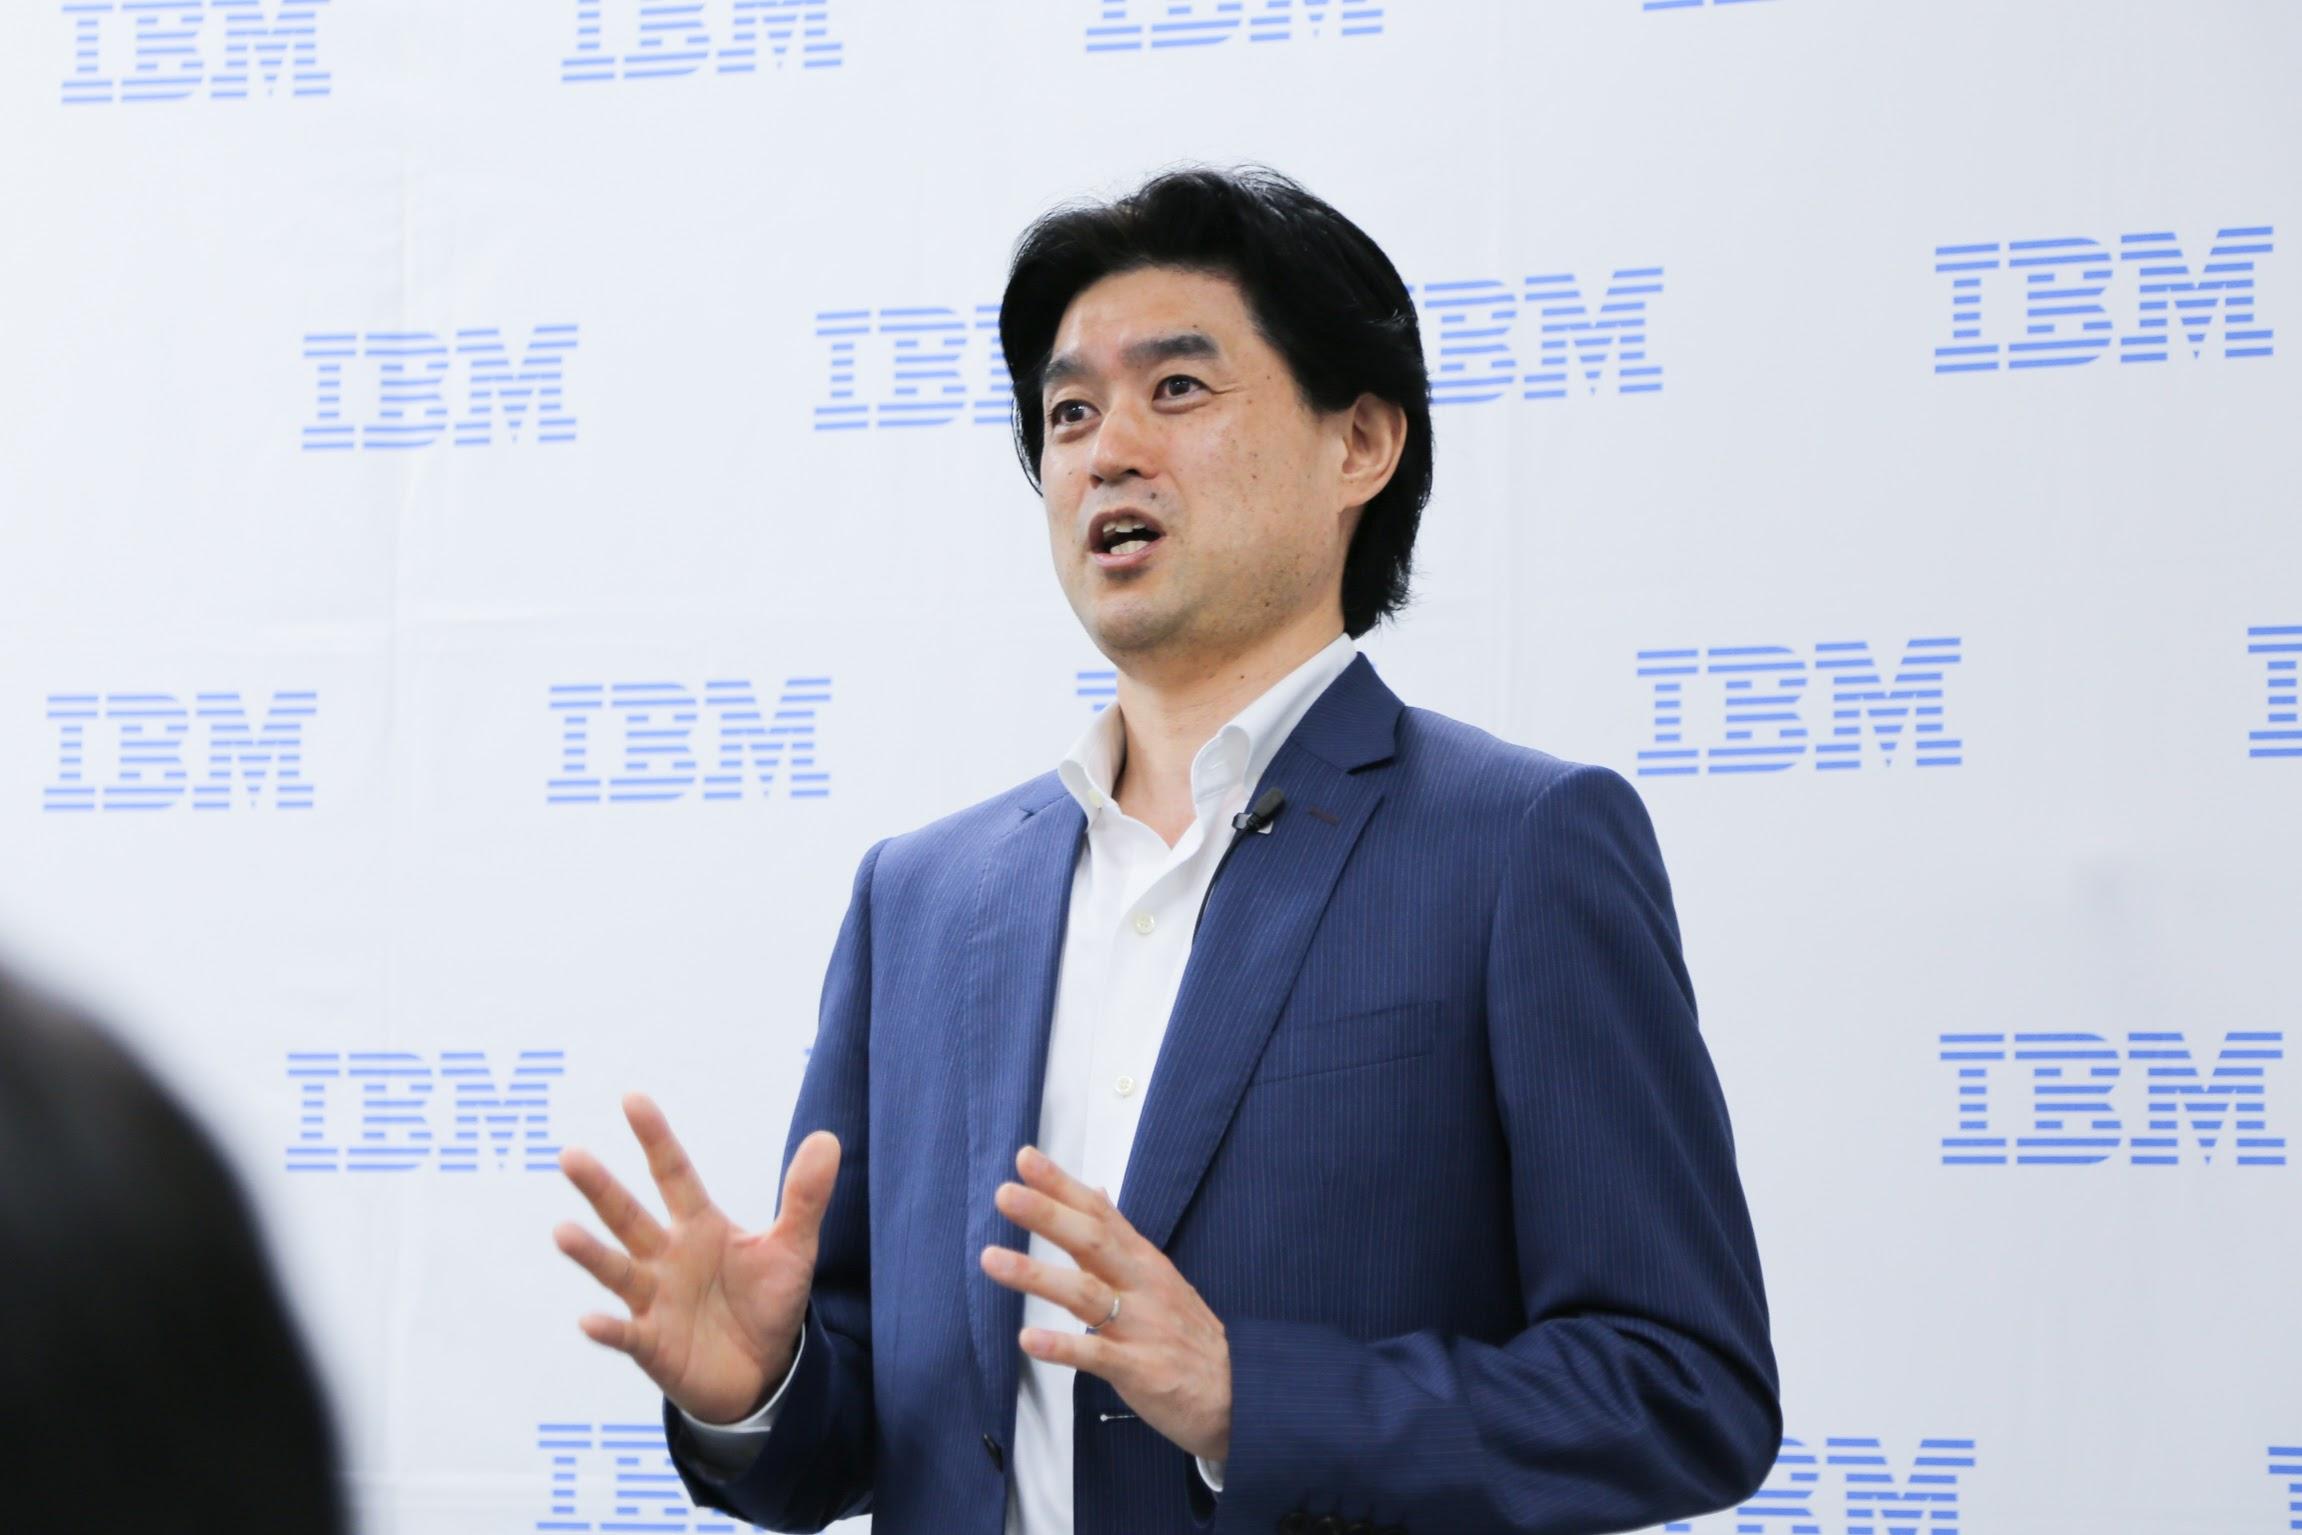 日本アイ・ビーエム株式会社 Watson IoT事業部 事業部長 林 健一郎氏